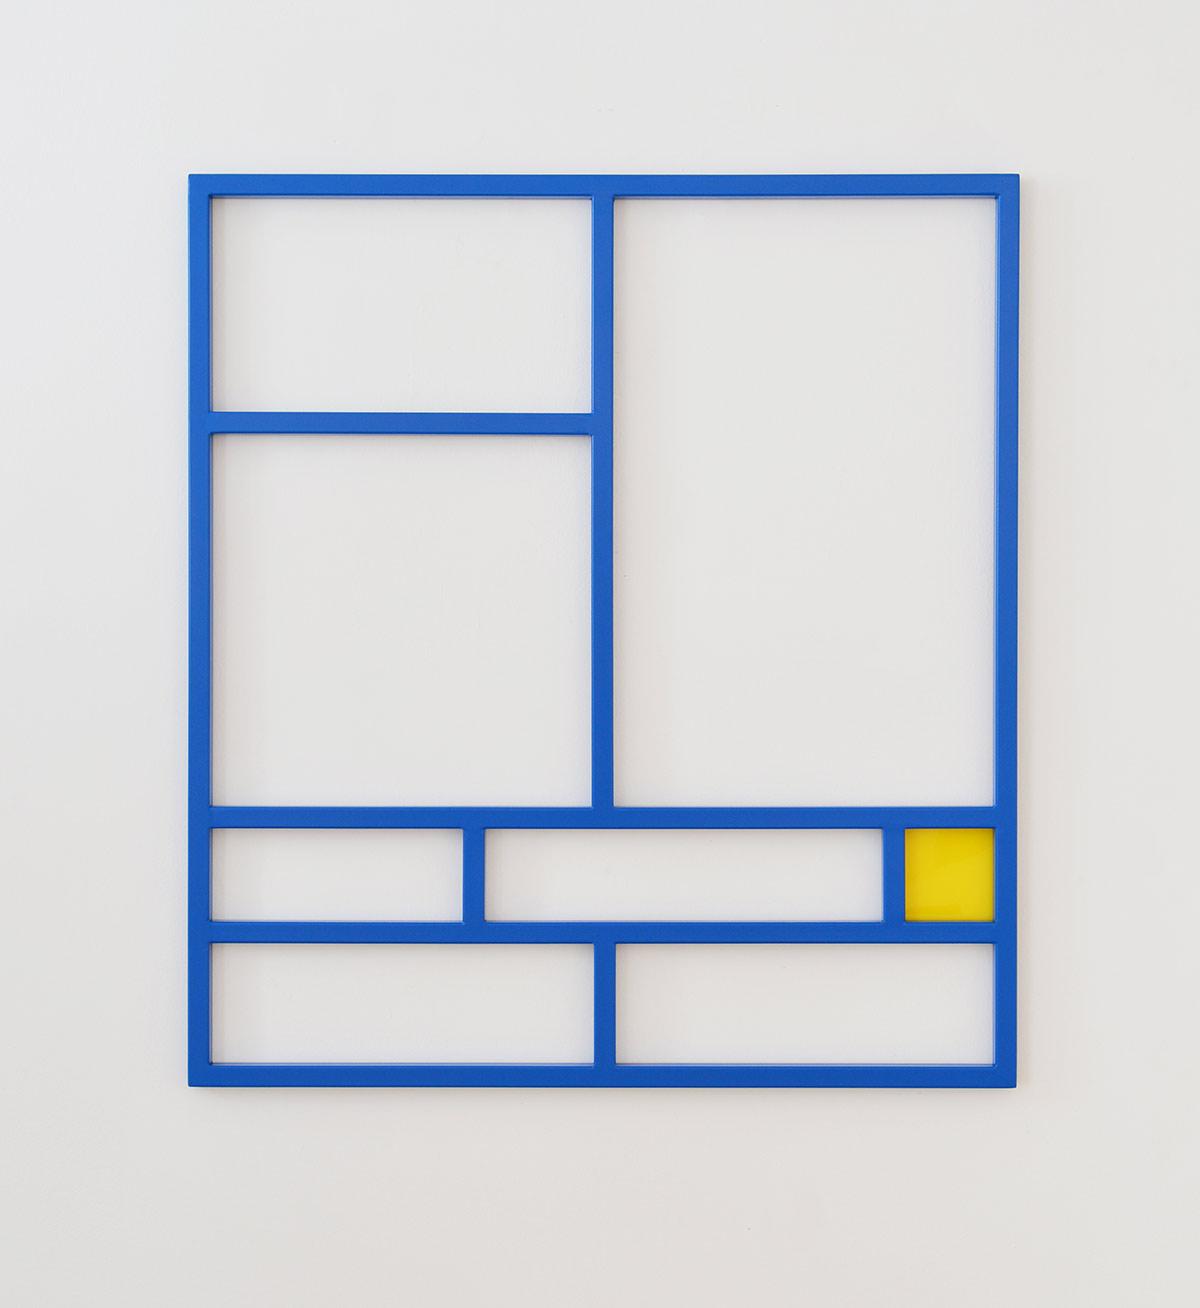 le mans, artwork, emanuel ehgartner, minimal, contemporary artist, 2021, blue